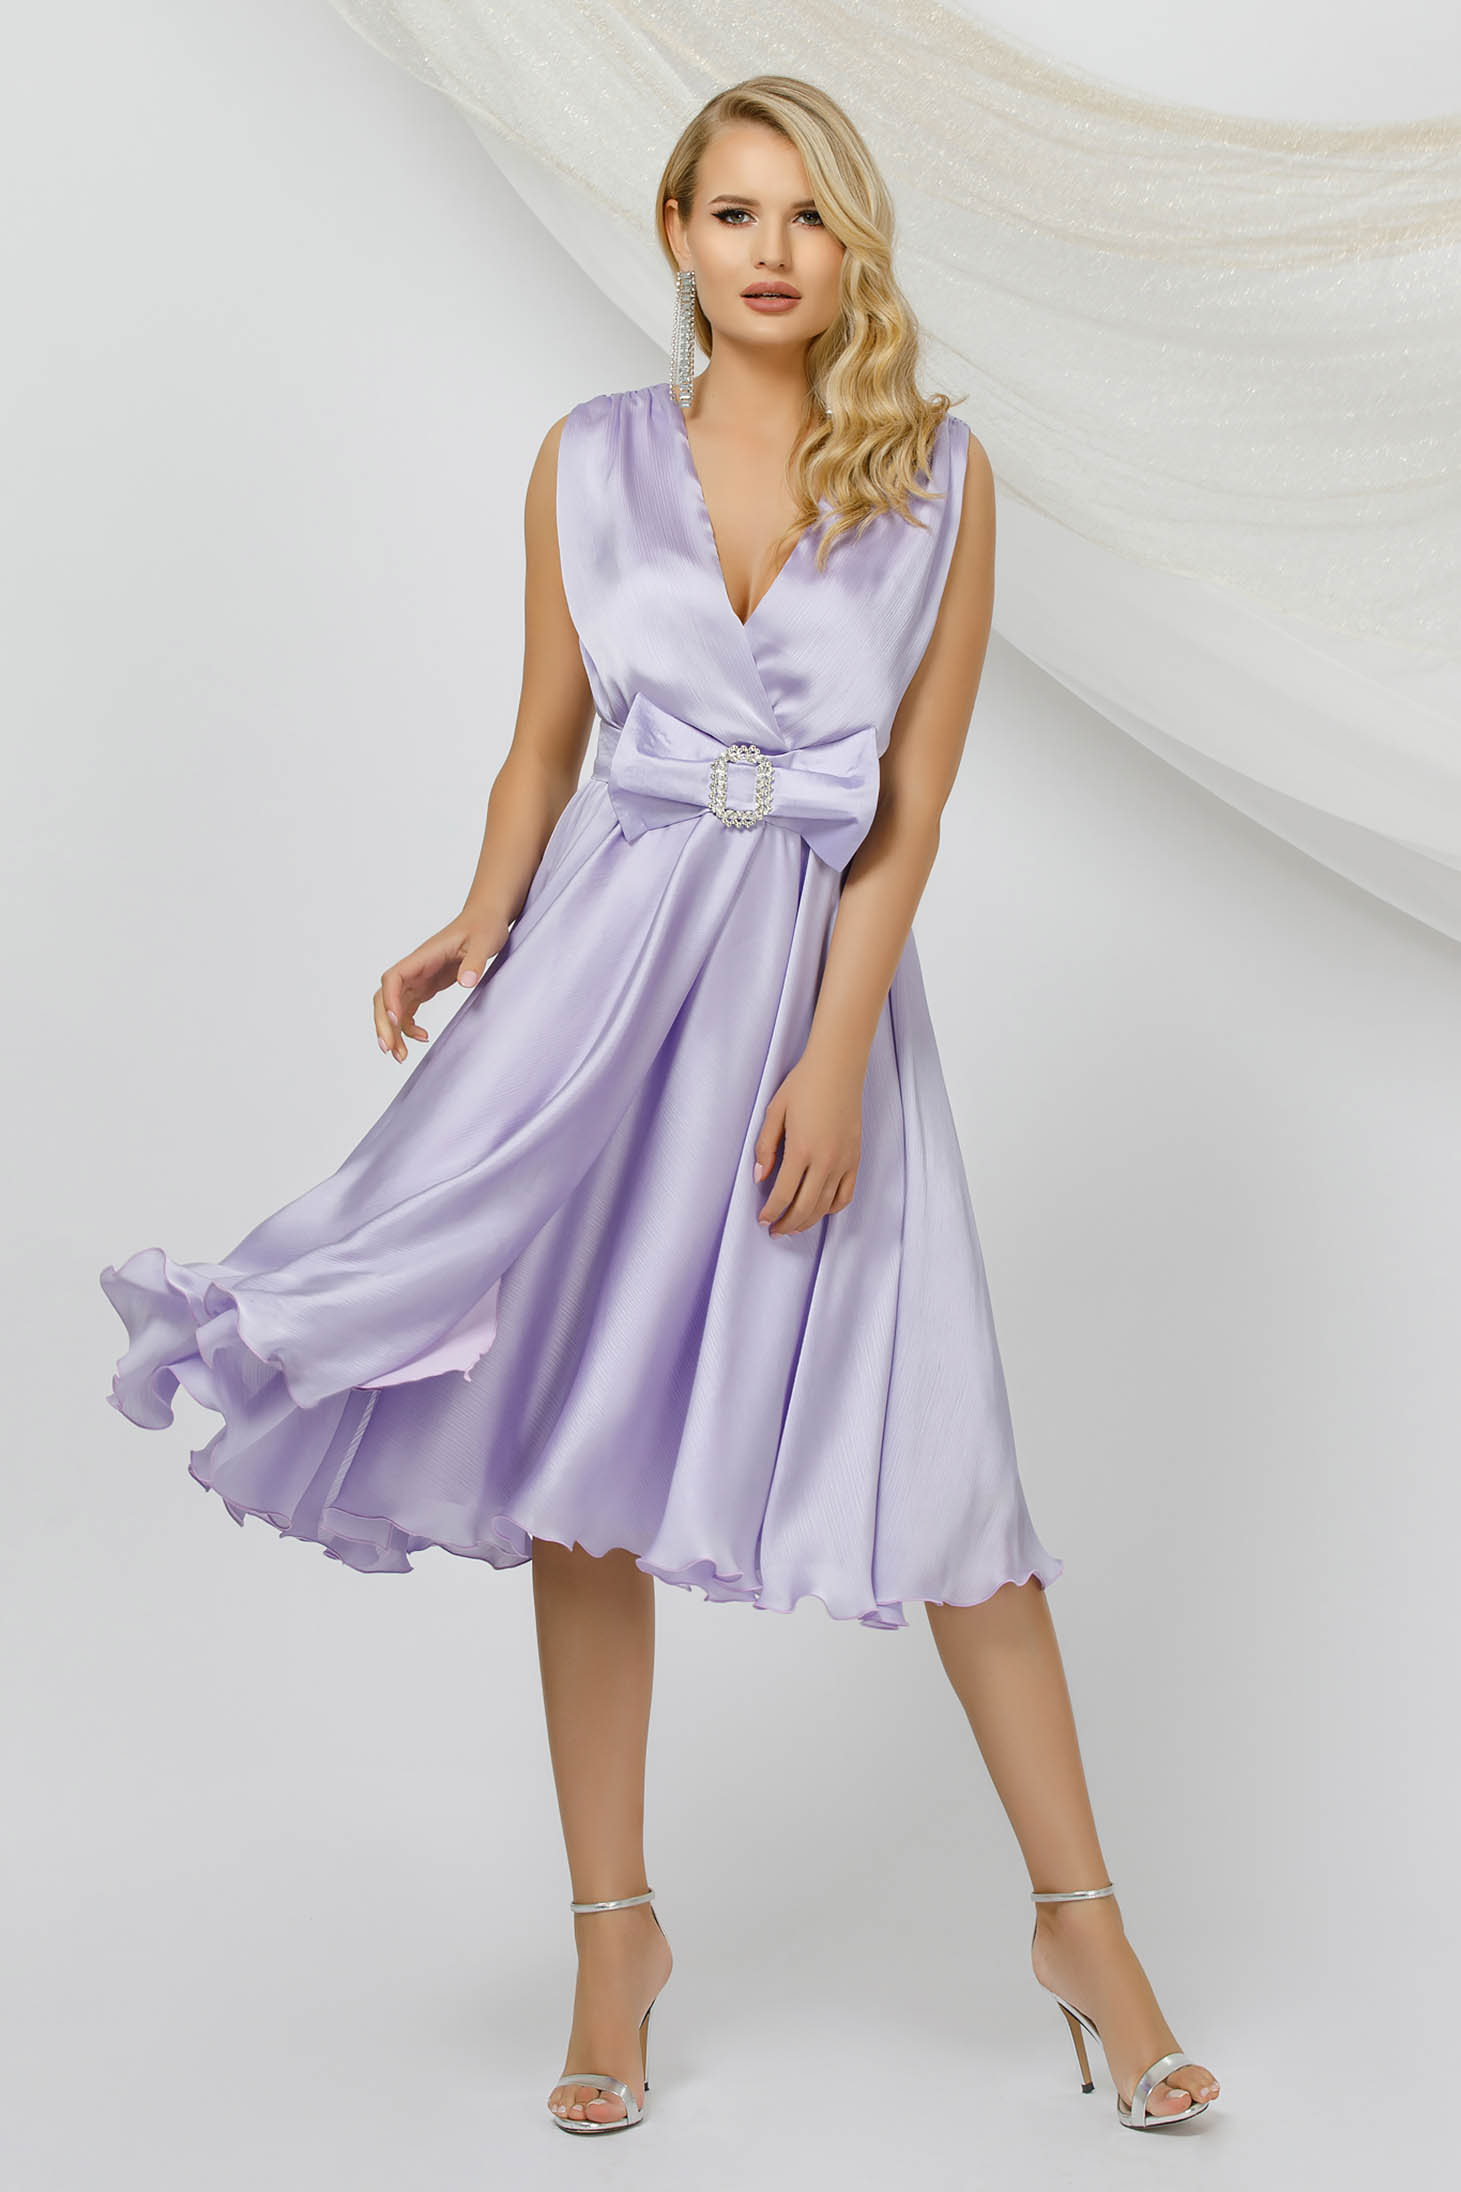 Lila dress midi occasional cloche from veil fabric sleeveless detachable cord